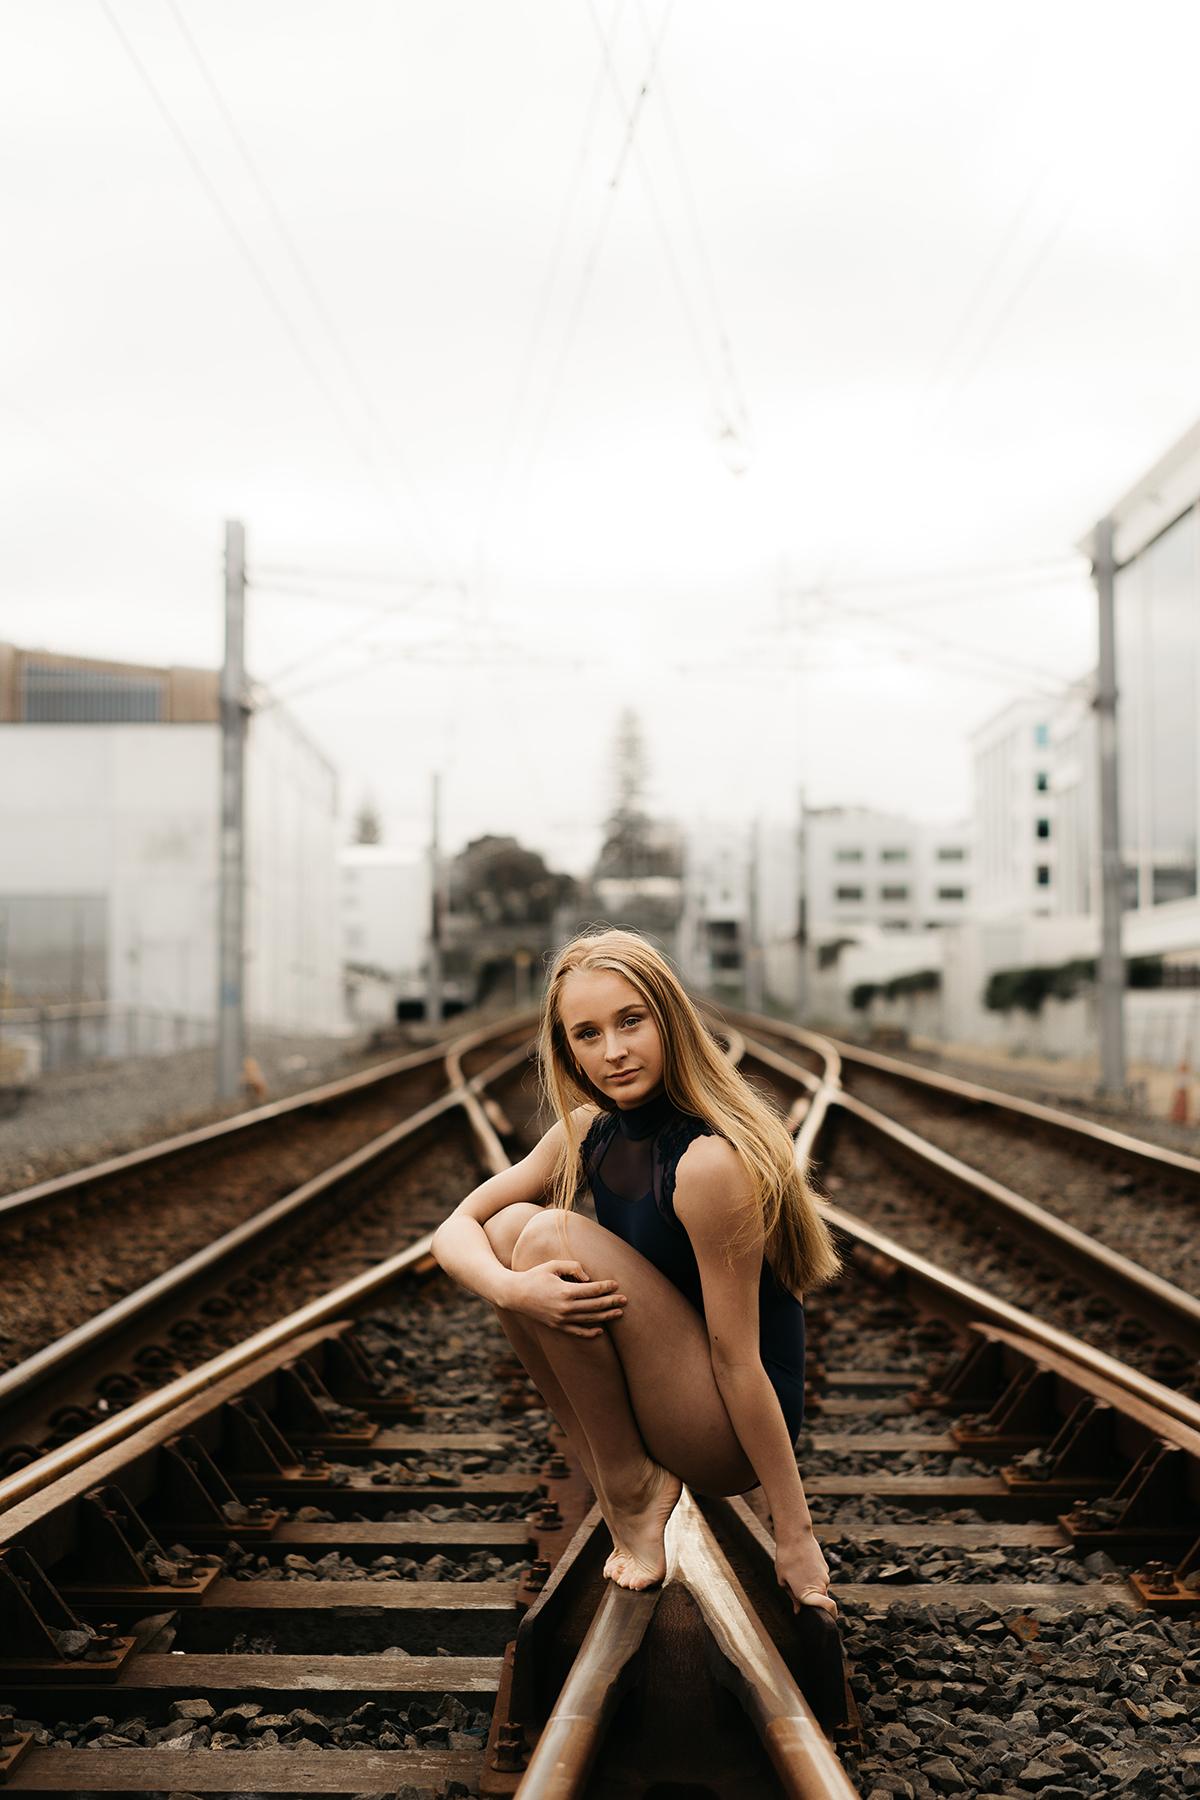 Keelia_Kennychickphotos-62.jpg